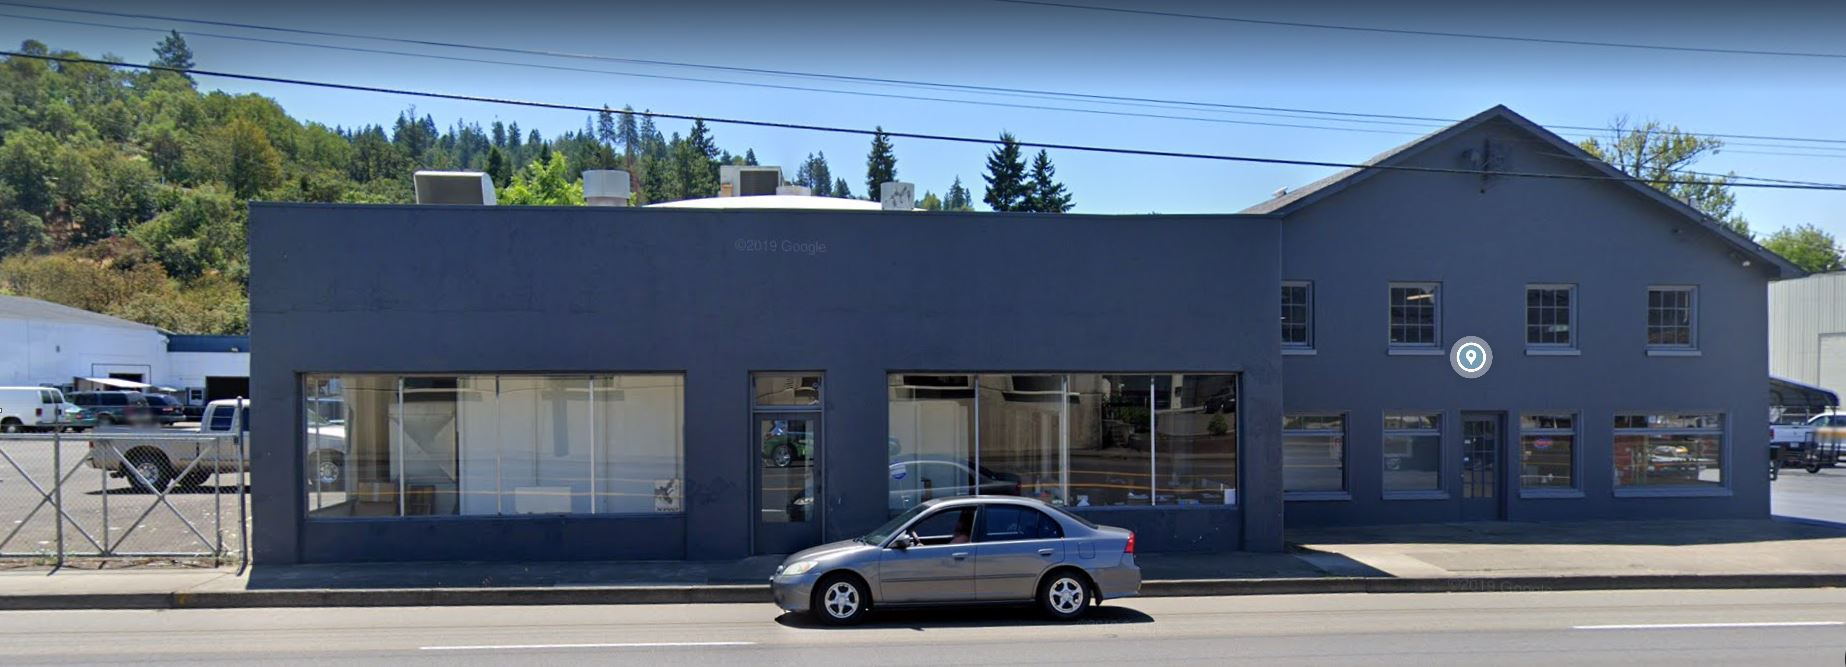 F & W Floor Covering - 1633 NE Diamond Lake Blvd, Roseburg, OR 97470